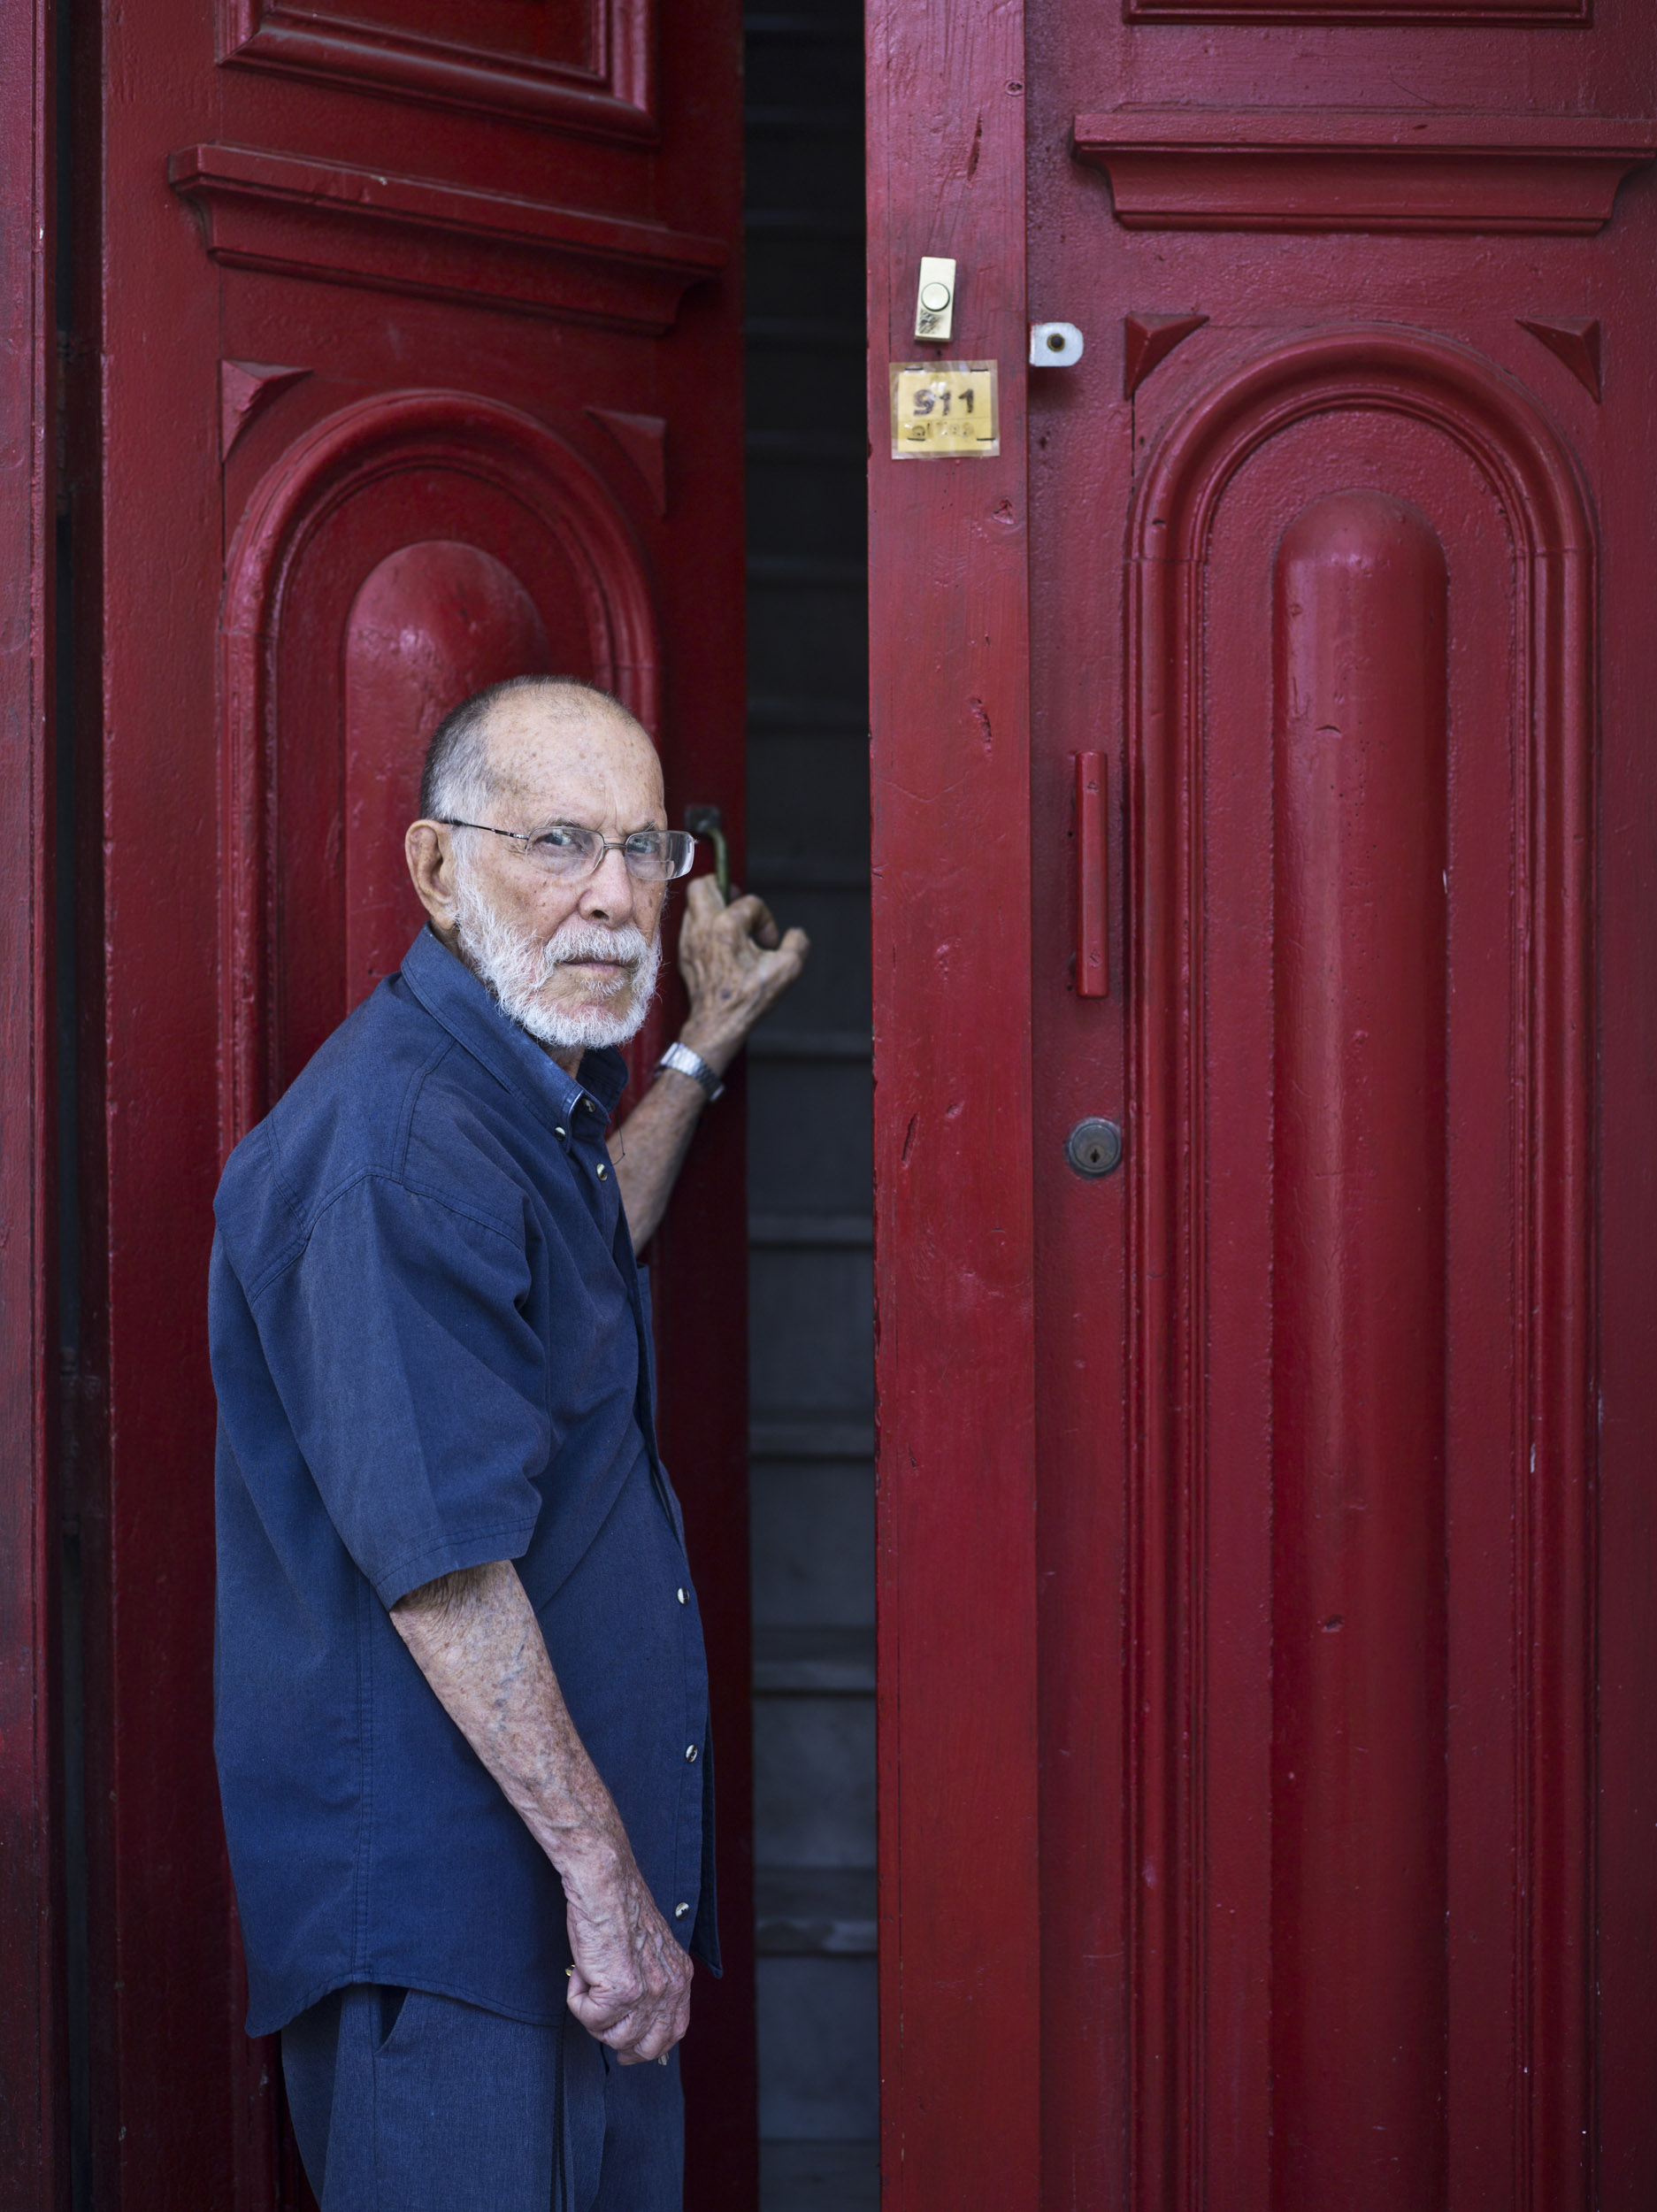 Abelardo Estorino, writer - Illuminated Cuba - Hector Garrido, Aerial and human photography